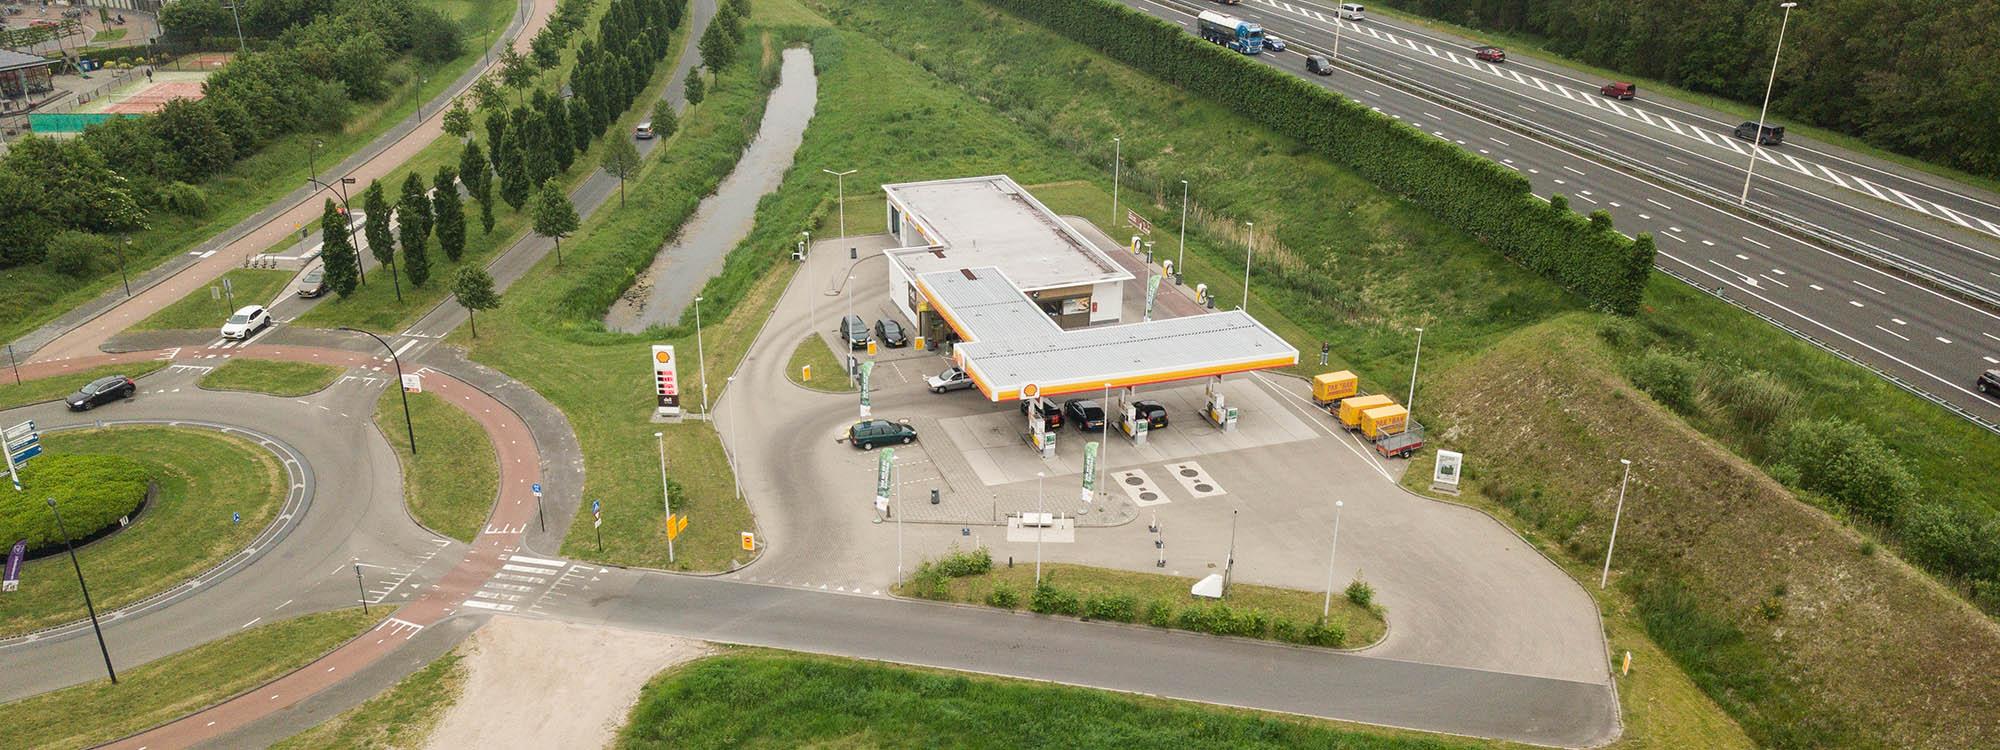 tankstation-vathorst-04